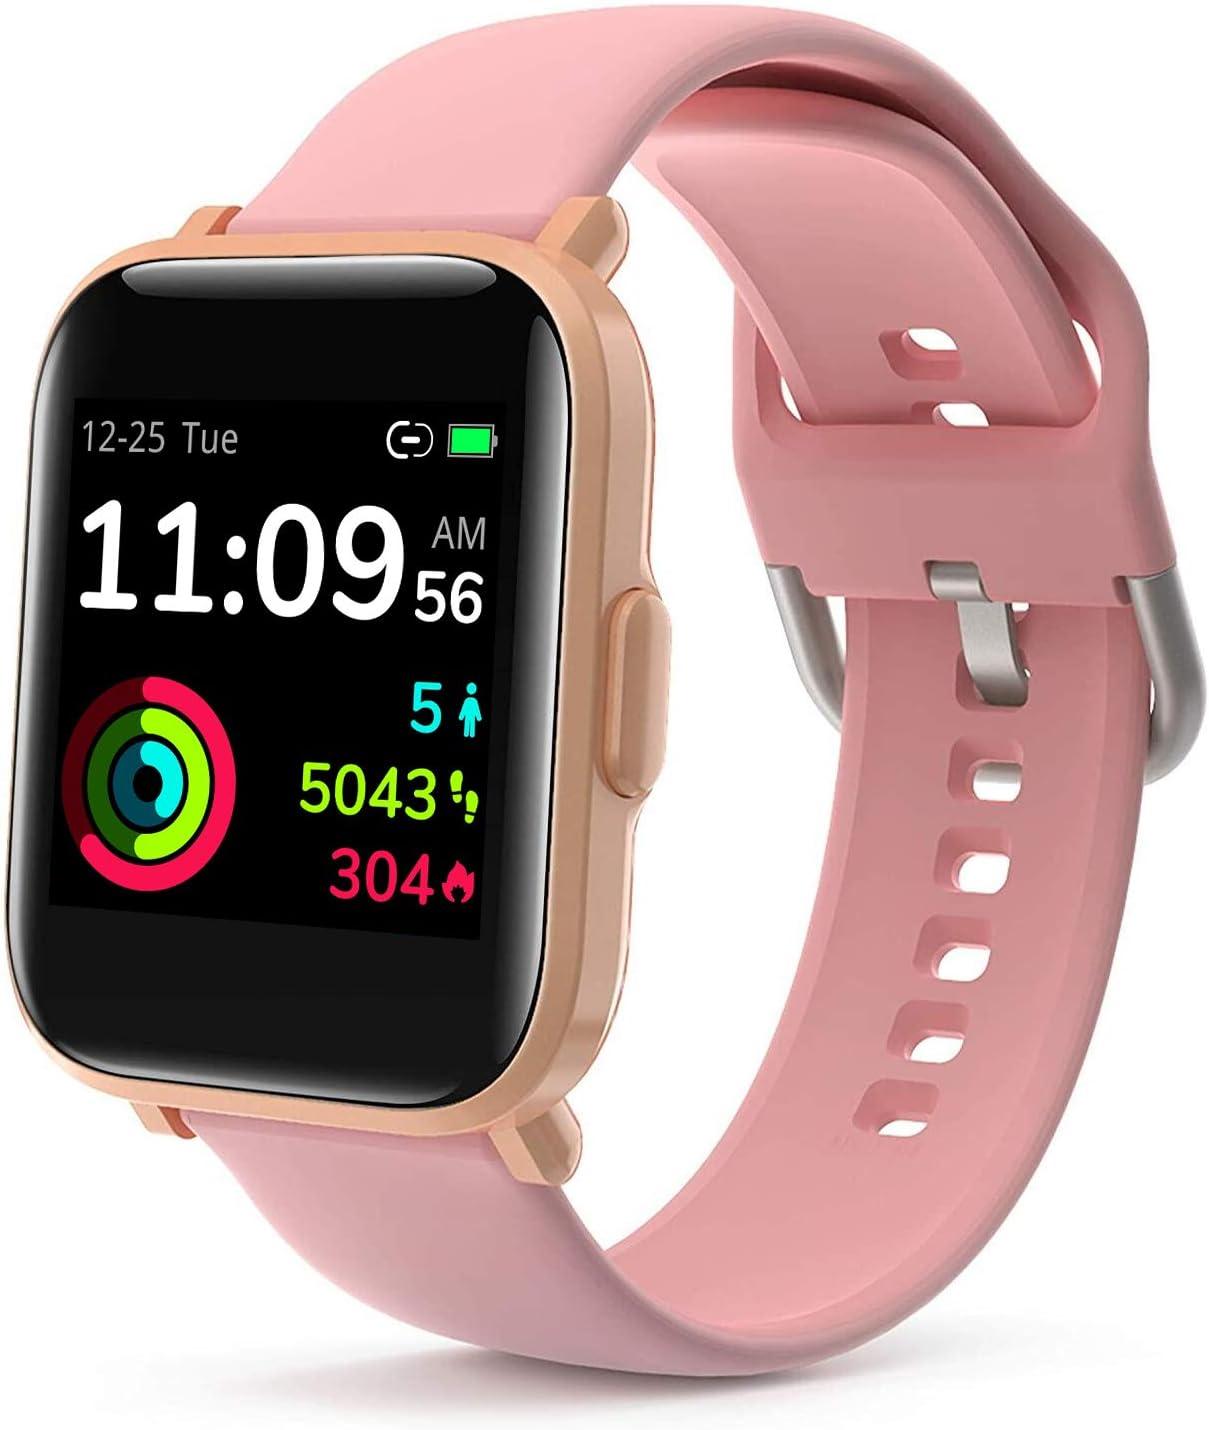 LIDOFIGO Reloj Inteligente Smartwatch Pantalla Táctil Actividad Inteligente IP68 Impermeable Reloj de Fitness Monitor de Sueño Pulsómetro Brújula Podómetro Cronómetro Smart Watch Mujer Rosa